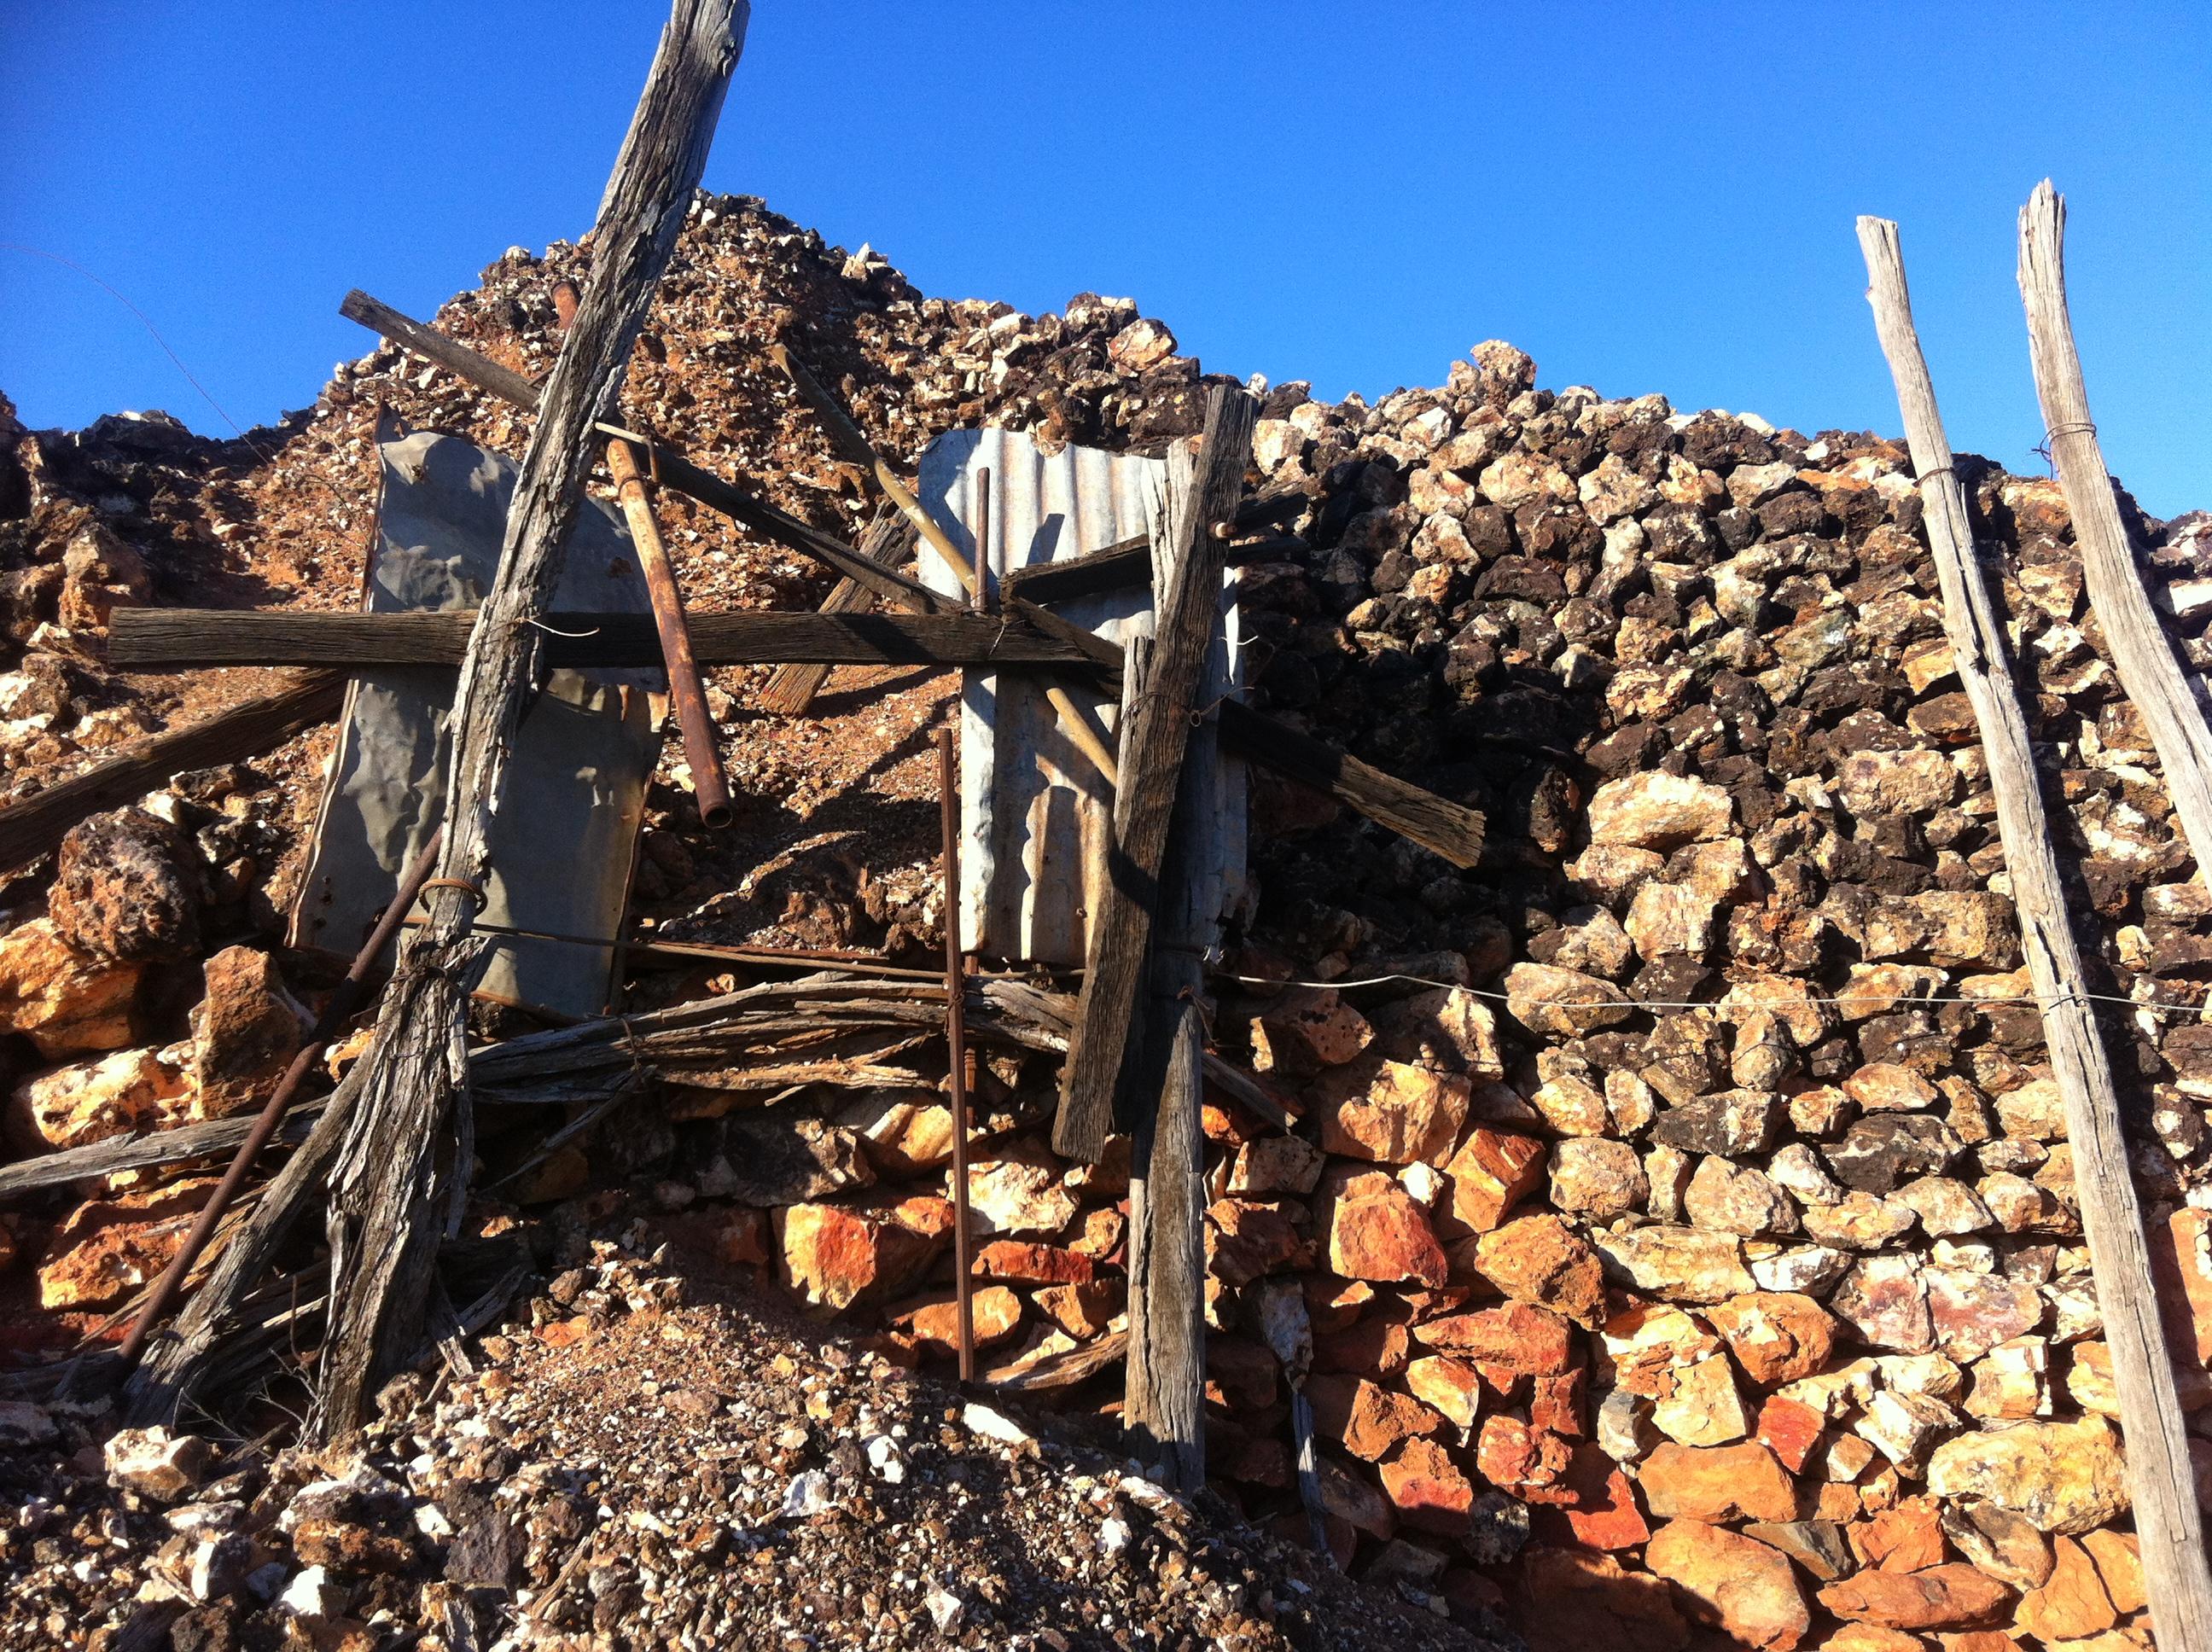 Ragged Hill #5 East Pilbara WA